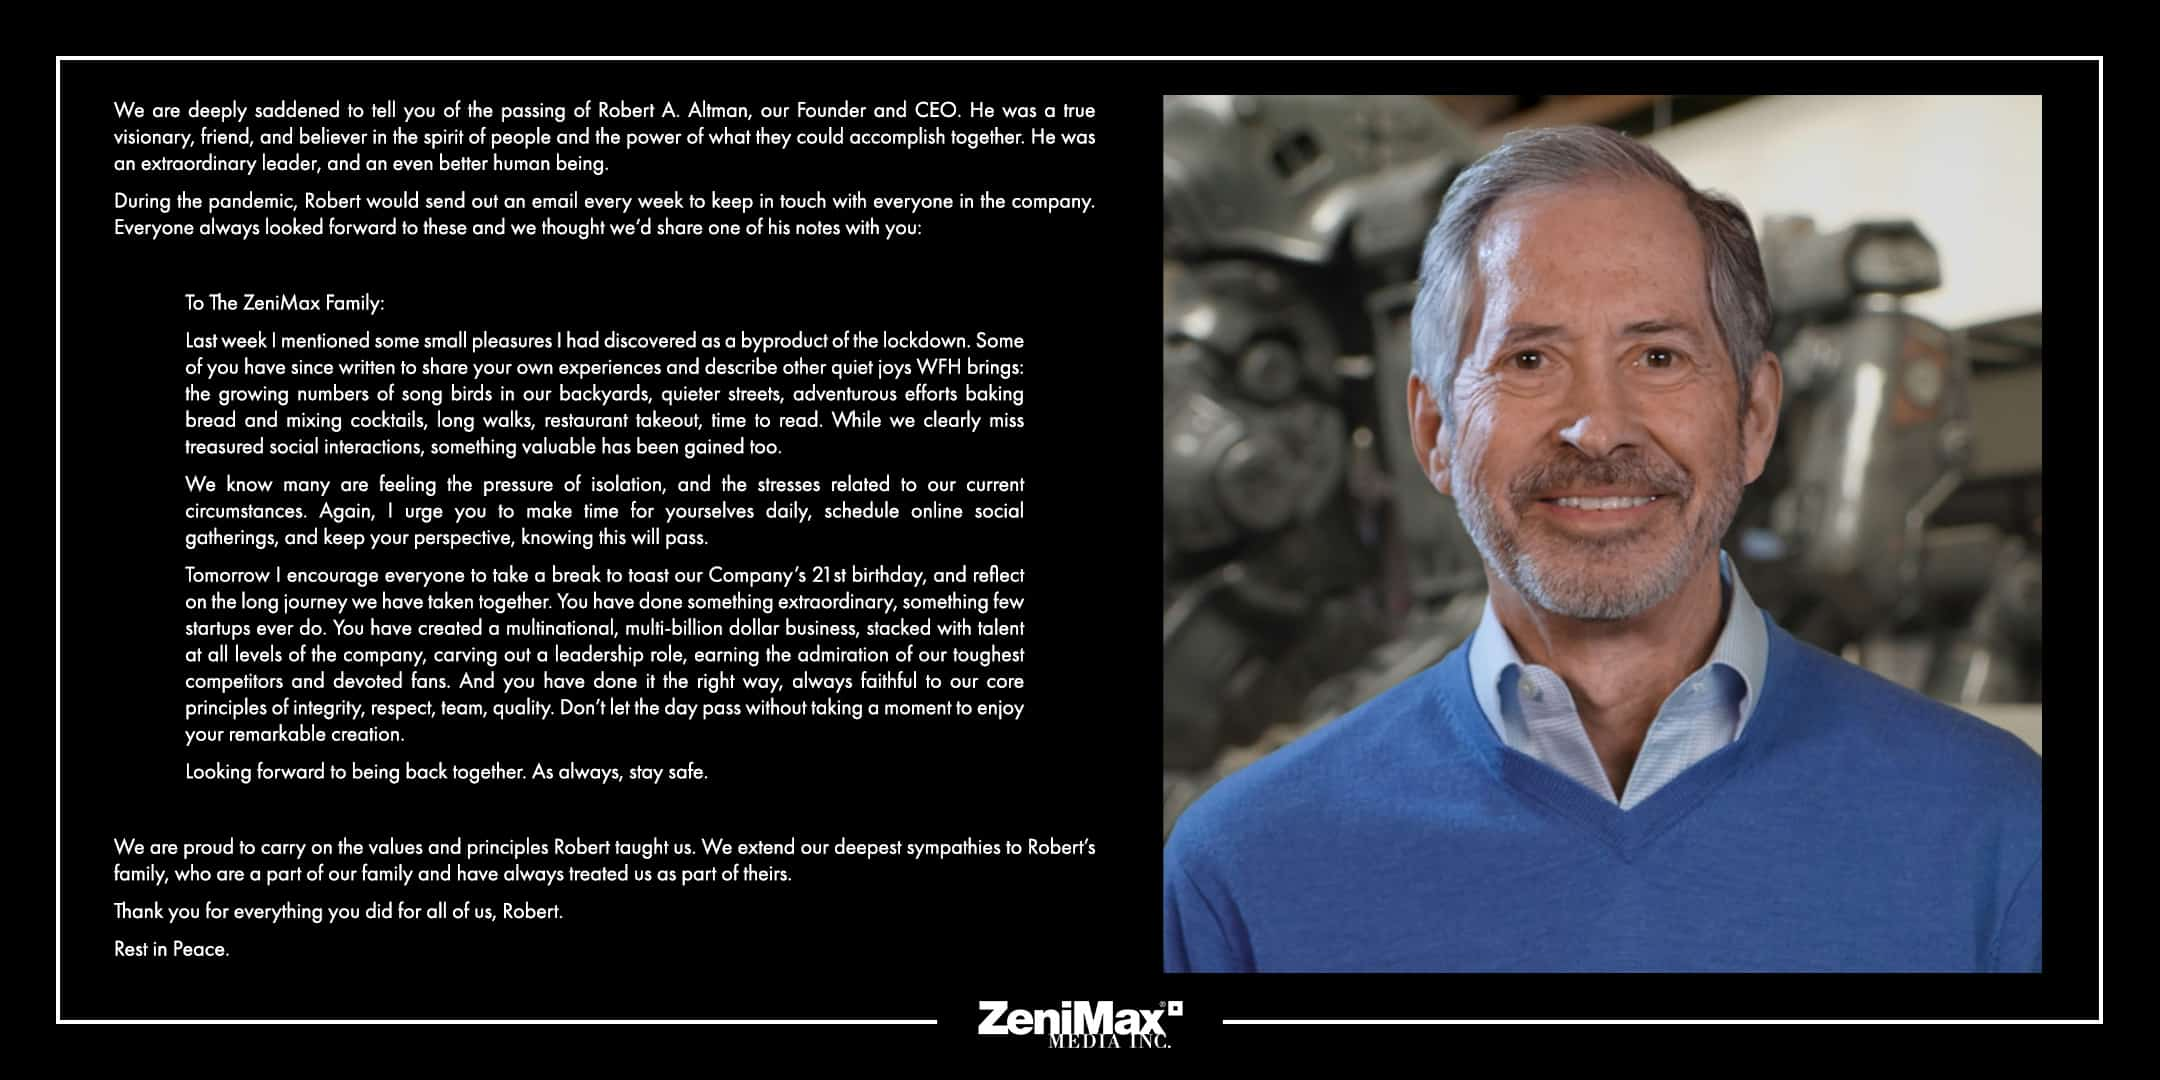 ZeniMax Media's Founder / CEO Robert A. Altman Passes Away At 73 4